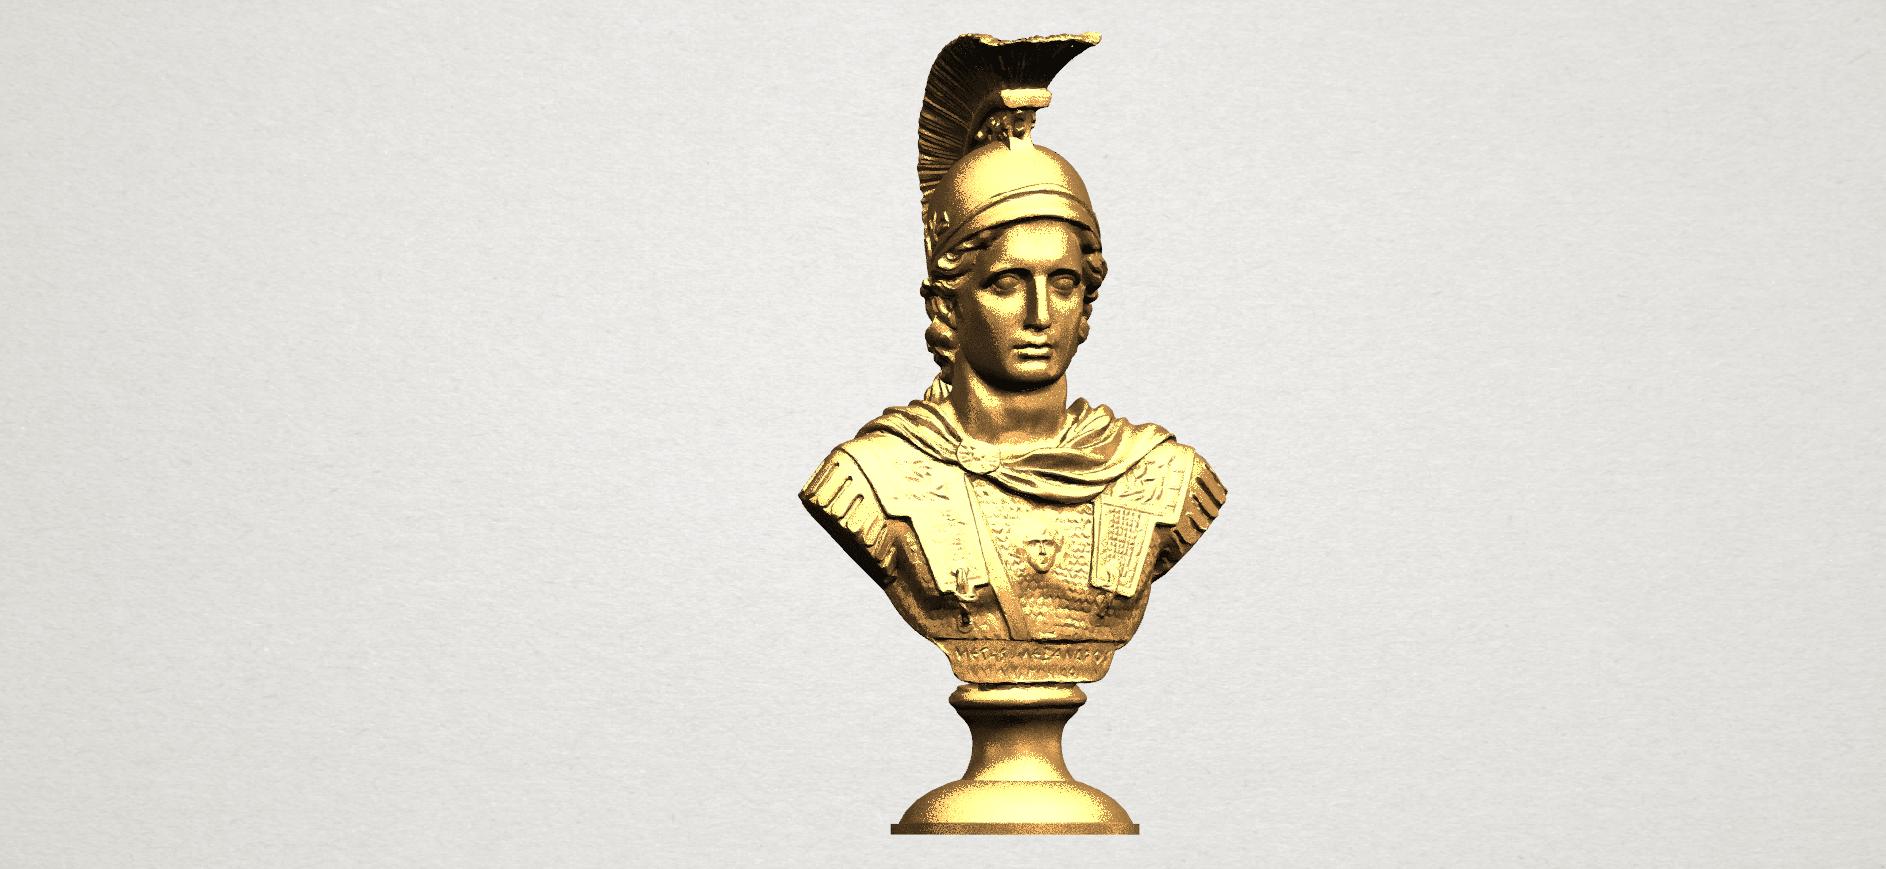 Alexander A01.png Download free STL file Alexander • 3D printer object, GeorgesNikkei